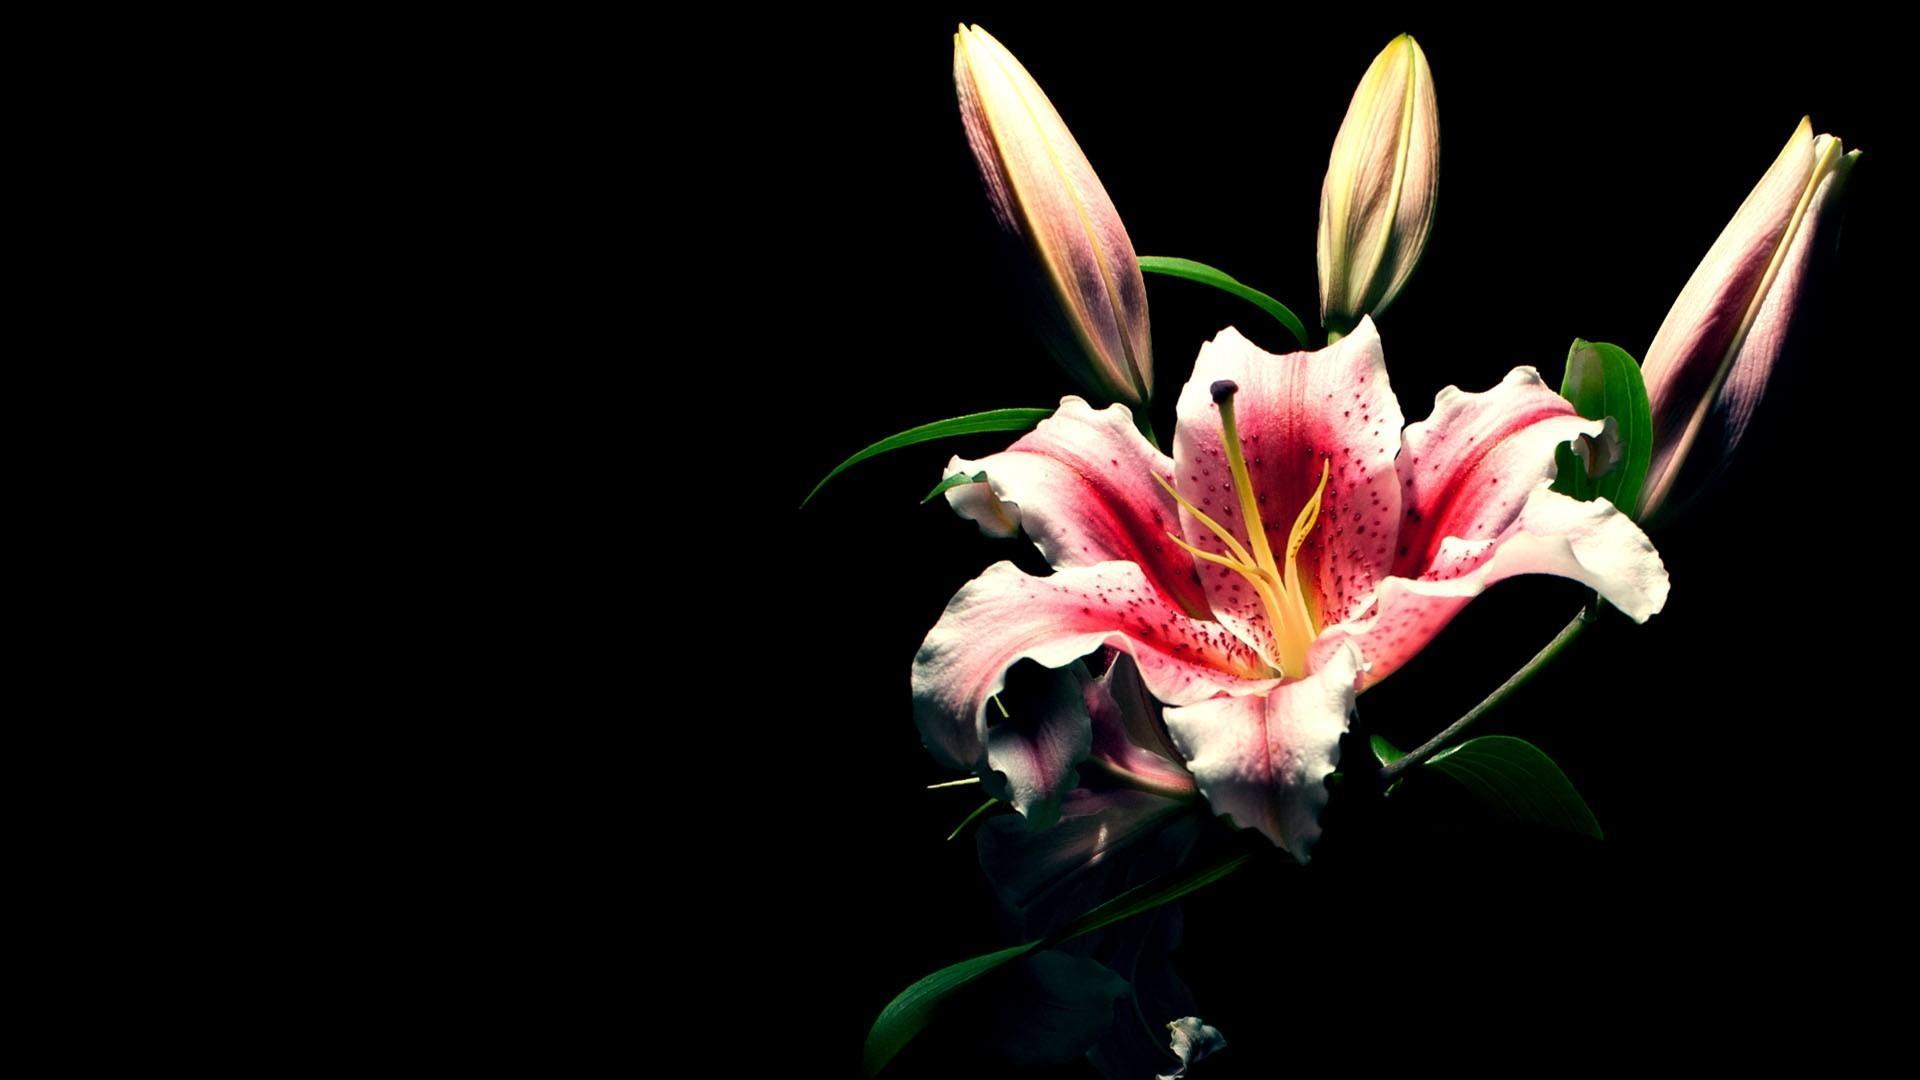 blue lily rose image